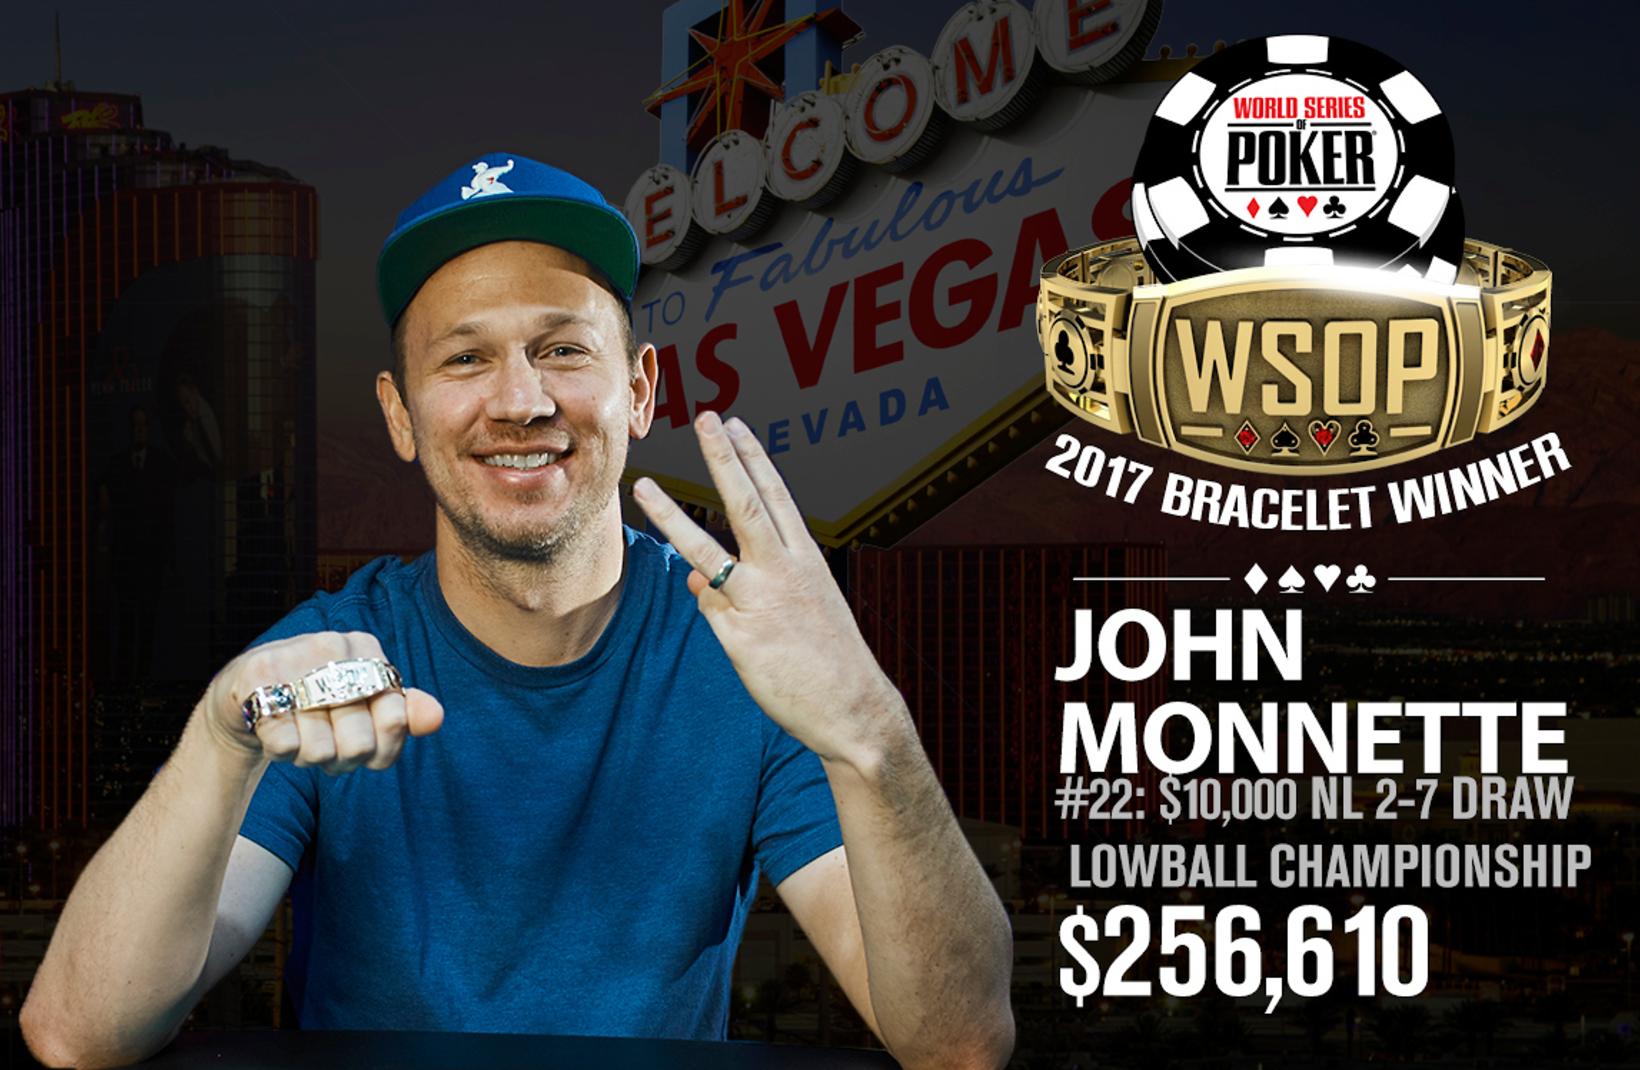 JohnMonnette_WSOP_Lowball_Champion